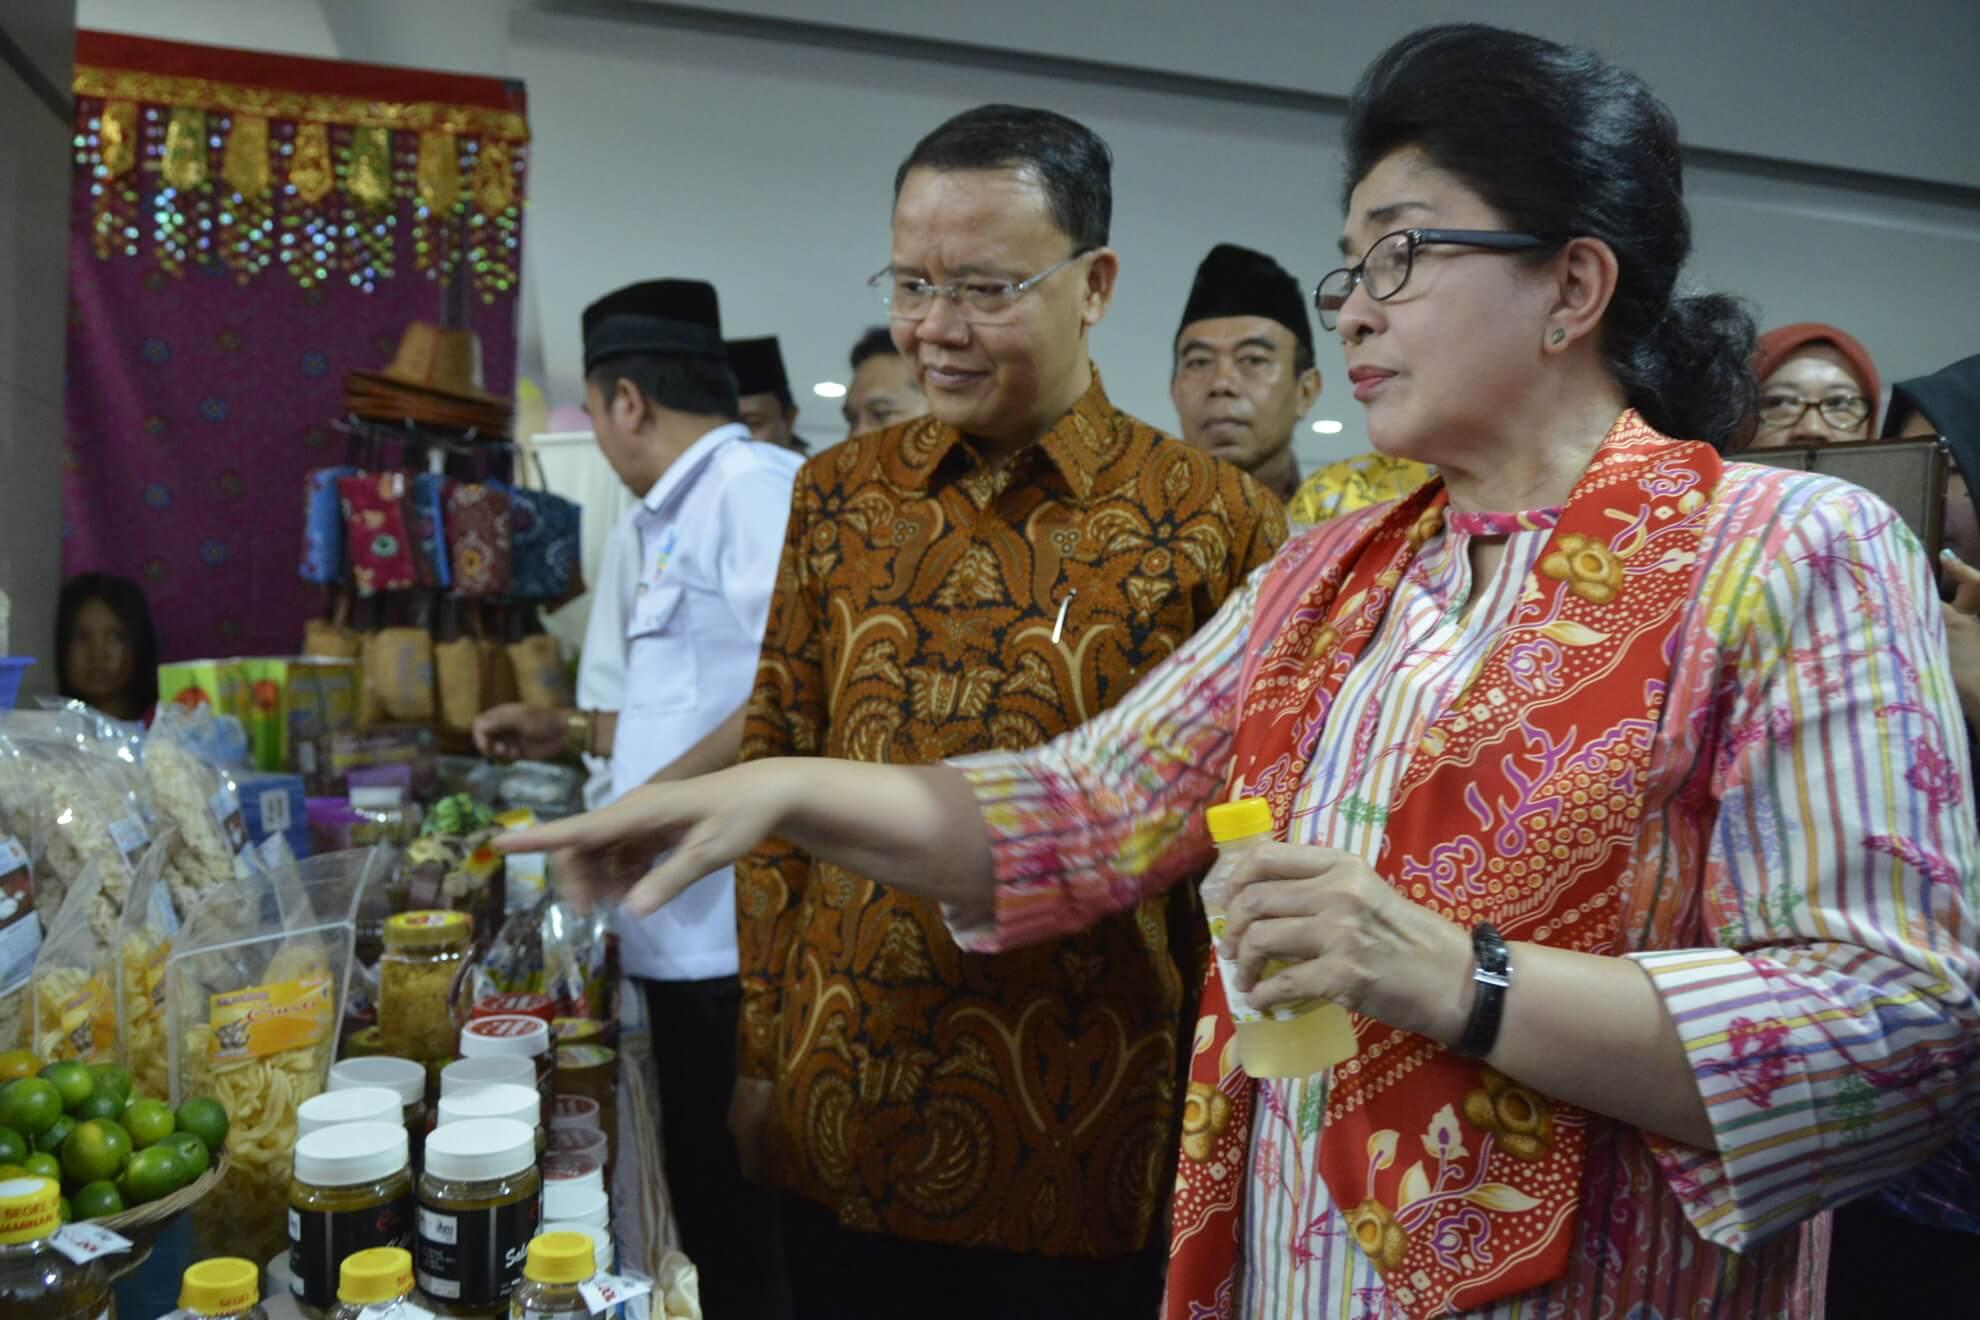 13-05-2017 Menkes Nila Moeloek bersama Wakil Gubernur Bengkulu Meninjau Produk Makanan dan Minuman UKM Lokal pada Pameran Rakerkesnas Provinsi Bengkulu (R46)